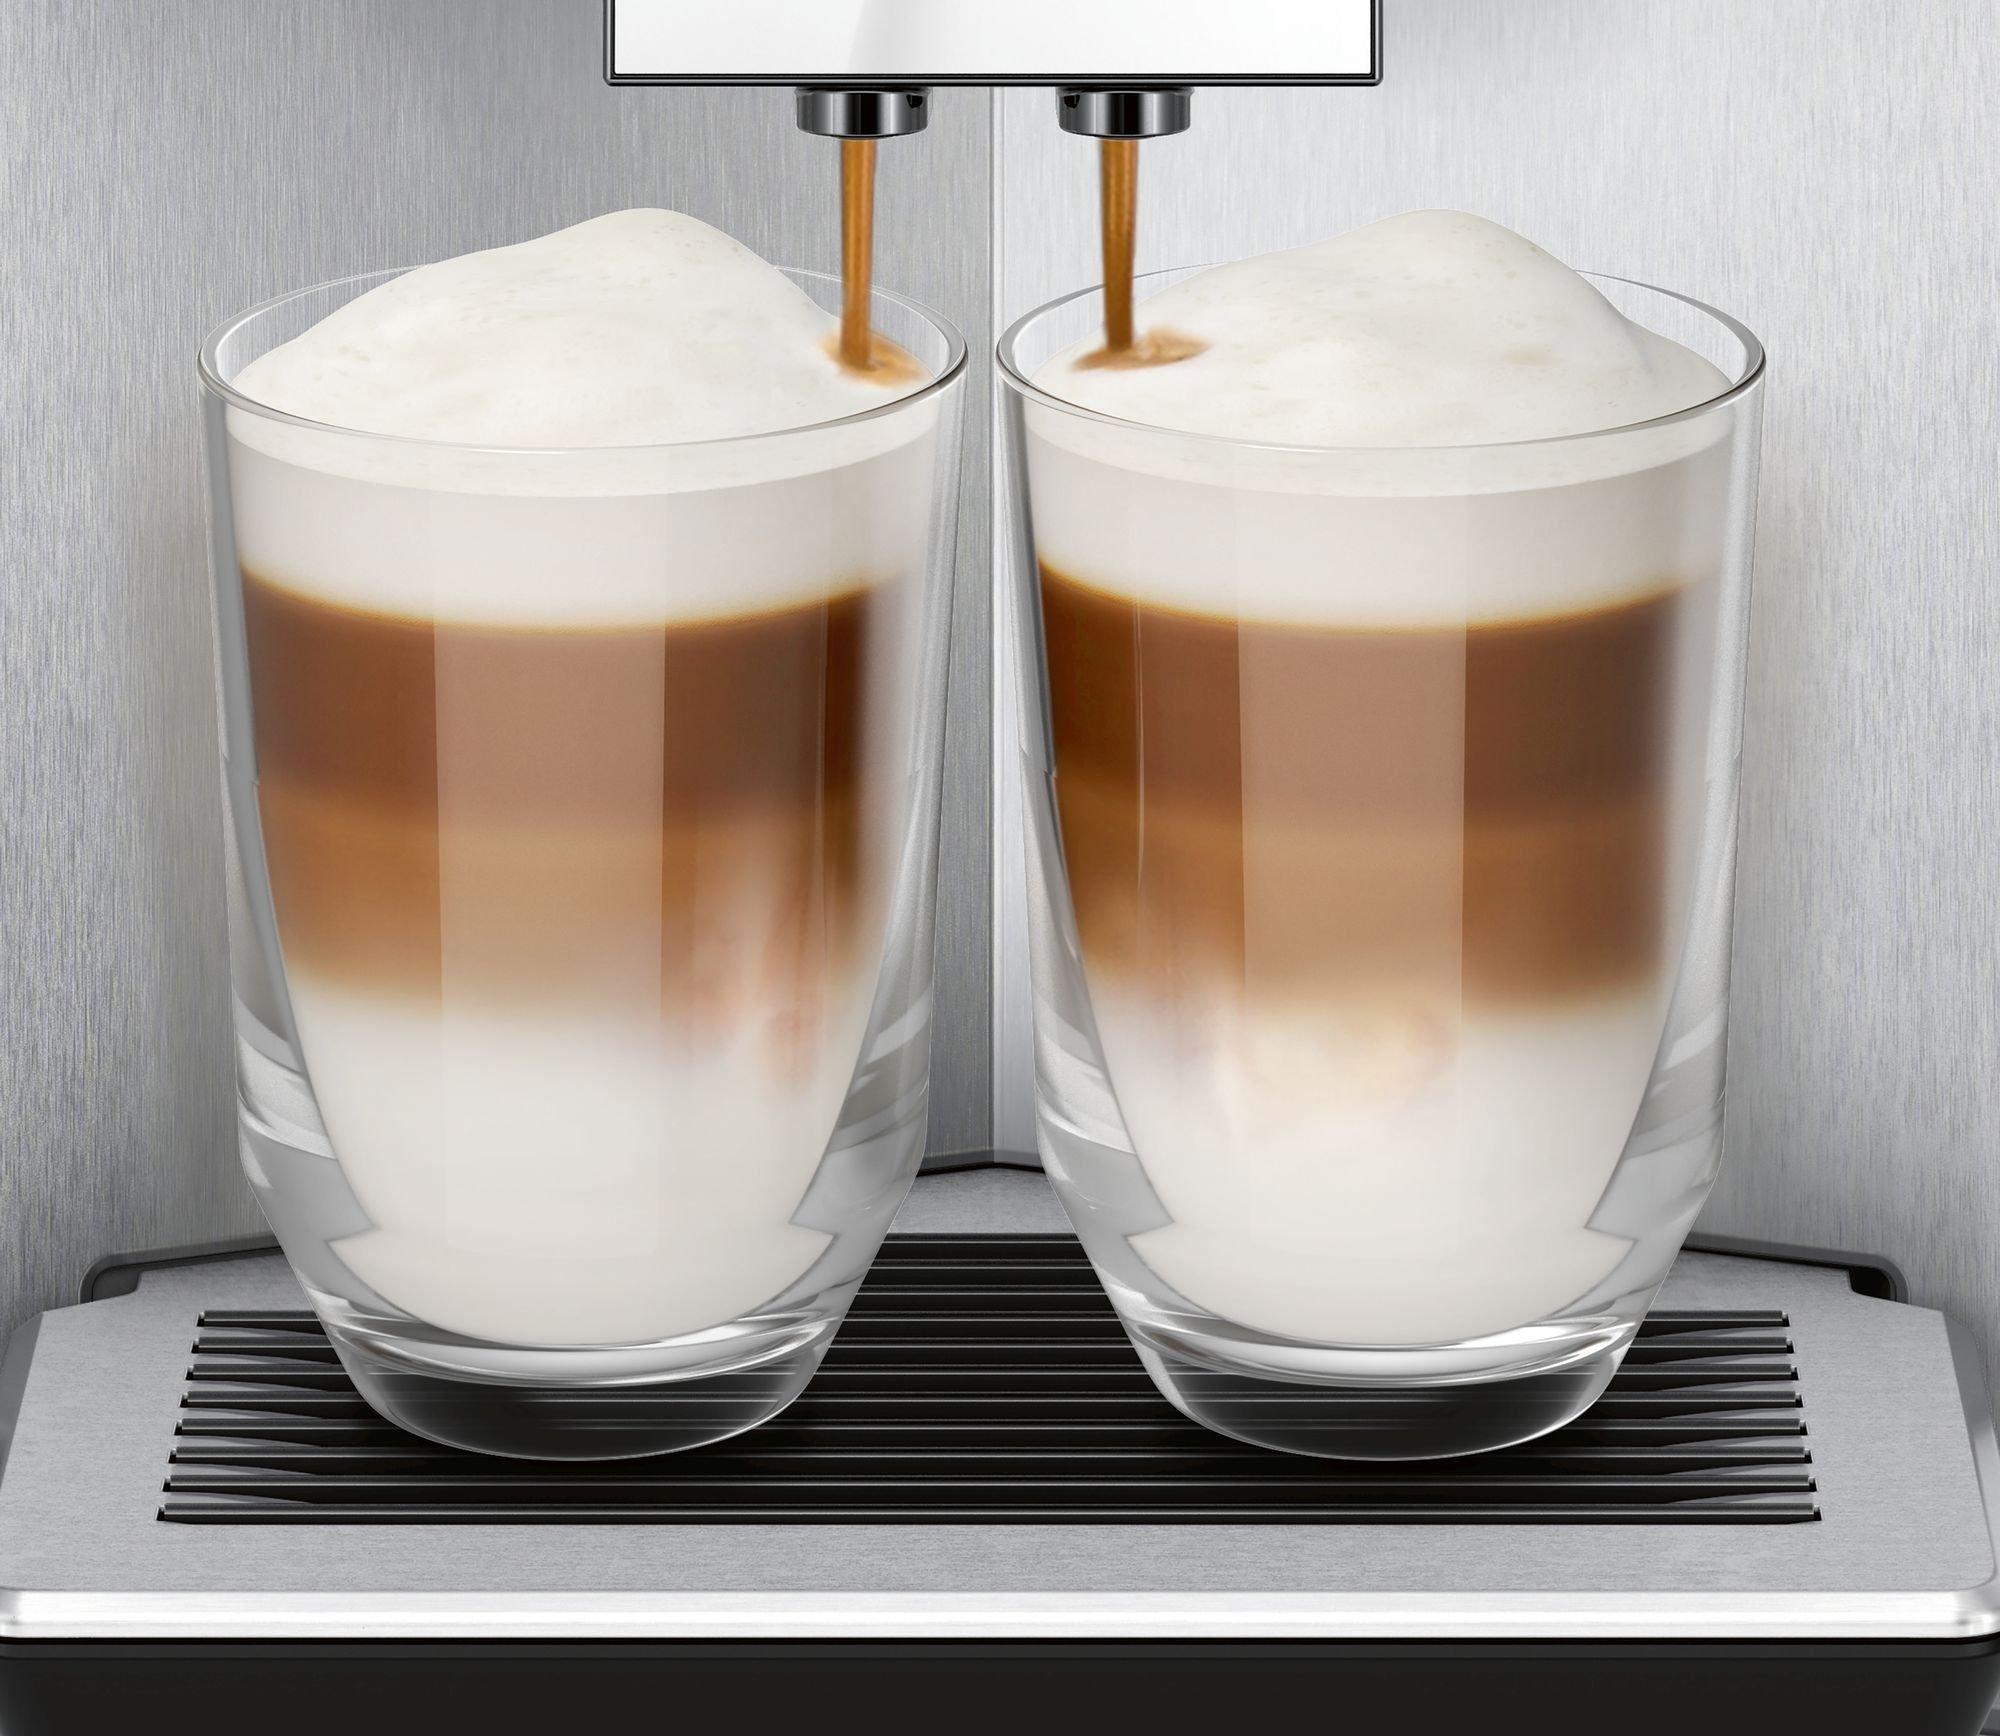 Кофеварка / кофемашина Siemens EQ.9 plus connect s700 TI9573X1RW